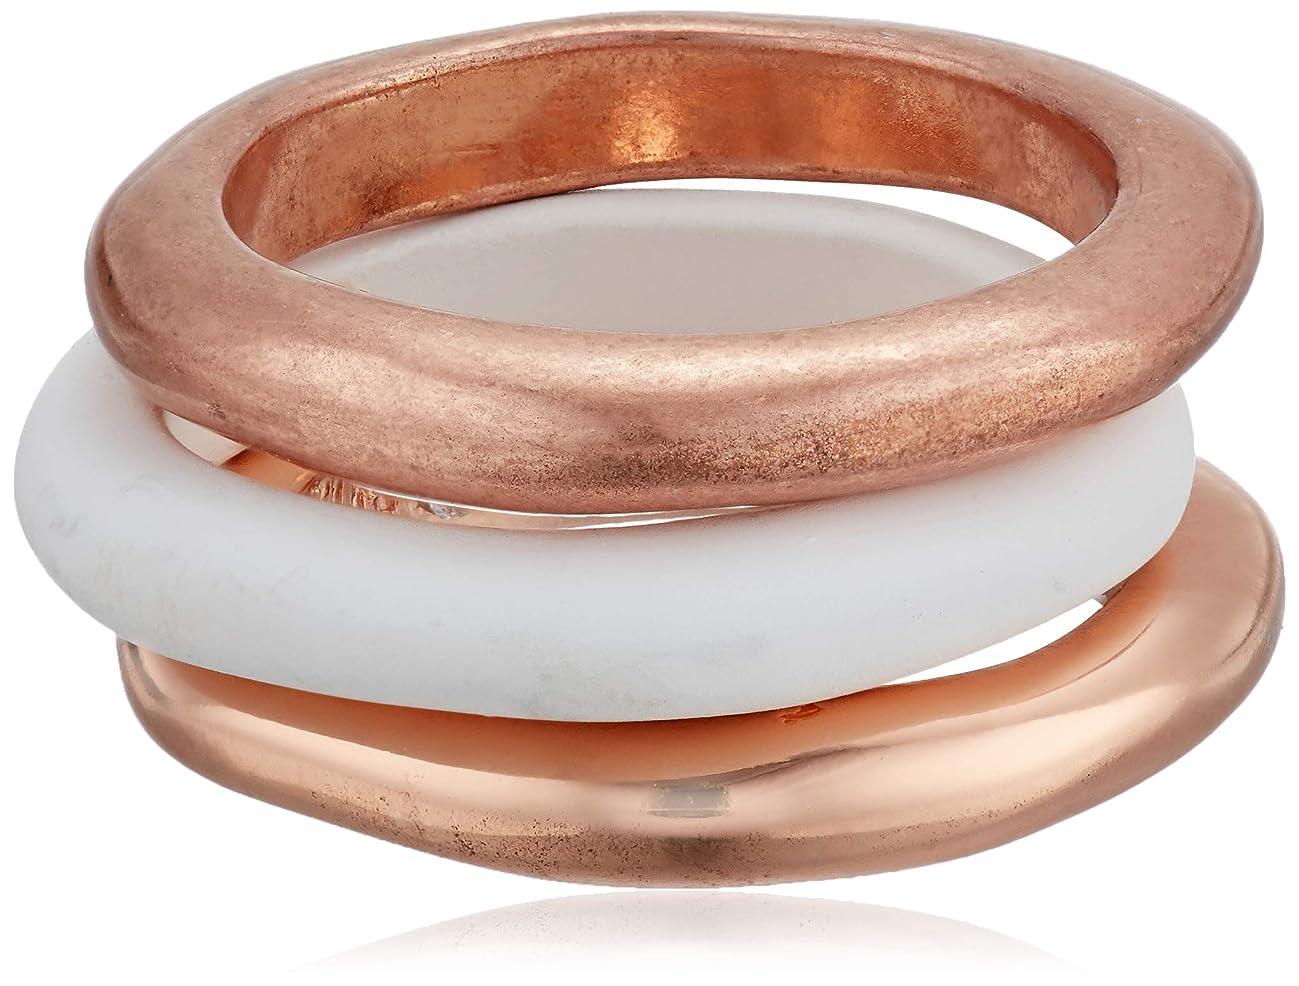 Robert Lee Morris Soho Women's White Patina & Rose Gold Sculptural Stackable Ring Set Size 7.5, One Size